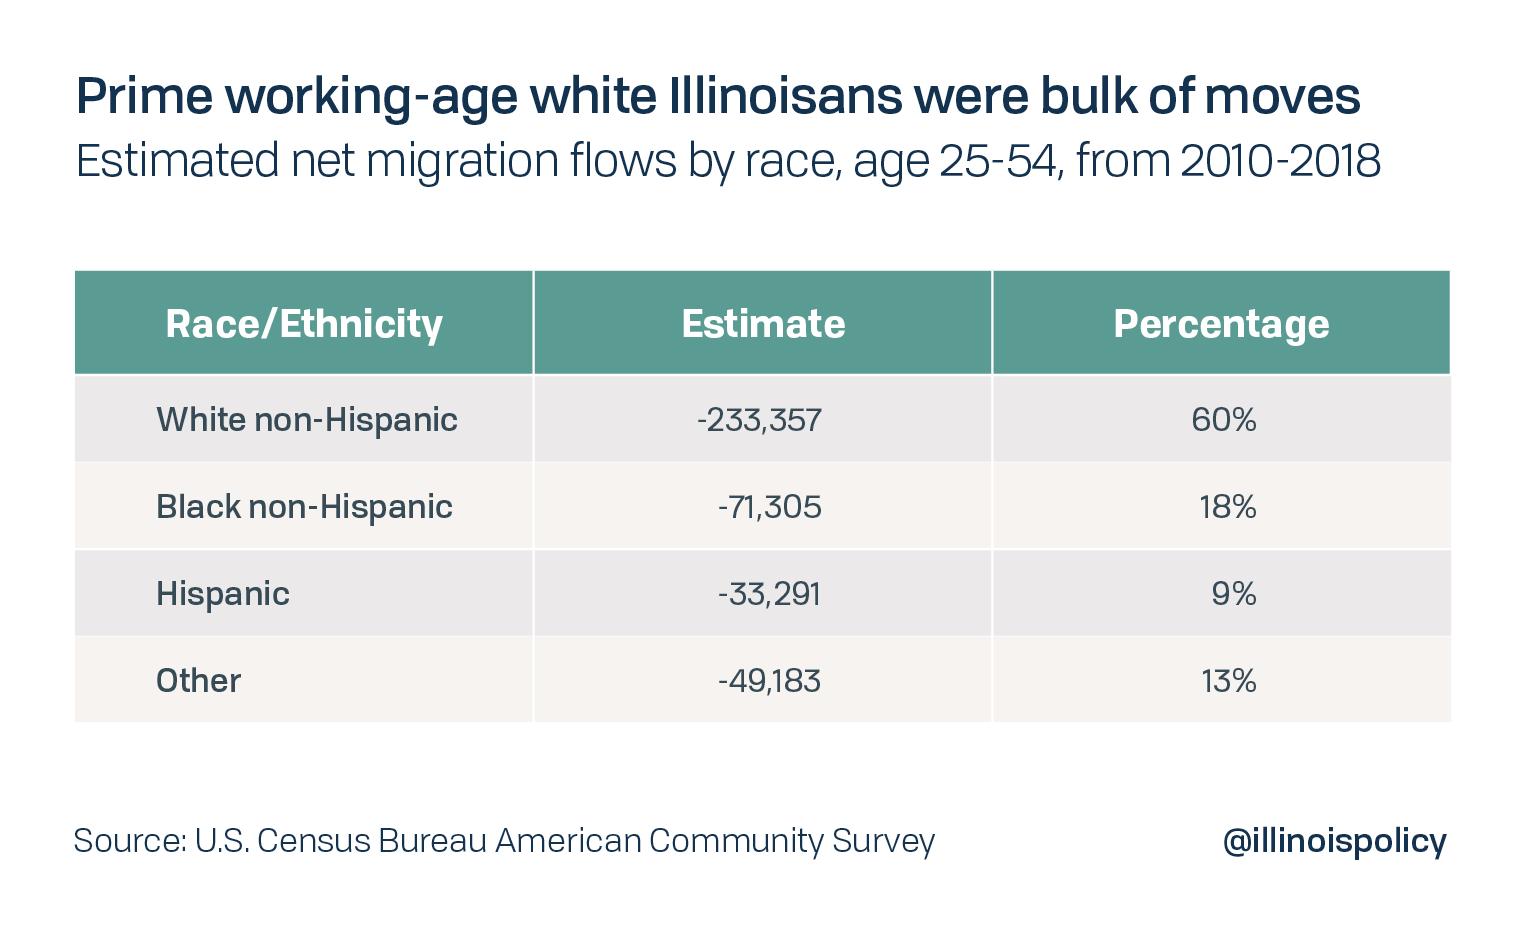 Prime working-age white Illinoisans were bulk of moves